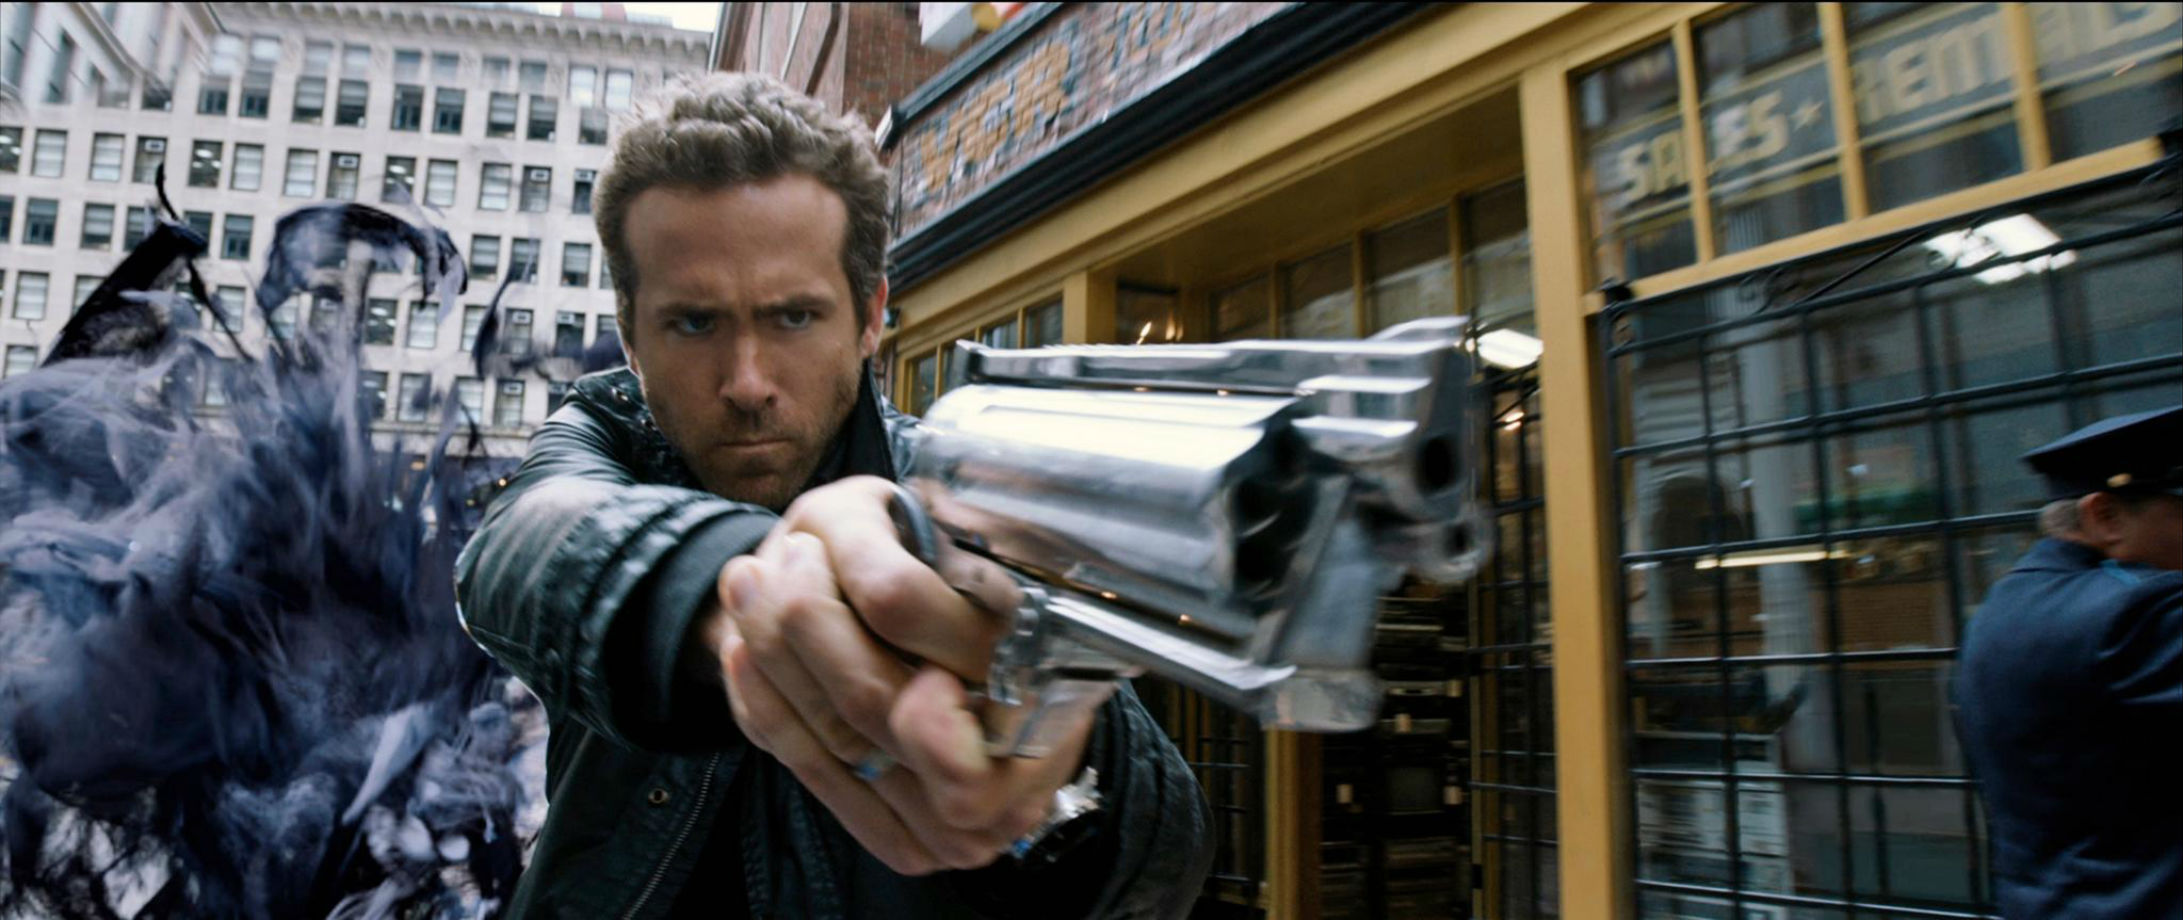 Ryan Reynolds RIPD weapons gun pistol wallpaper | 2183x920 ...